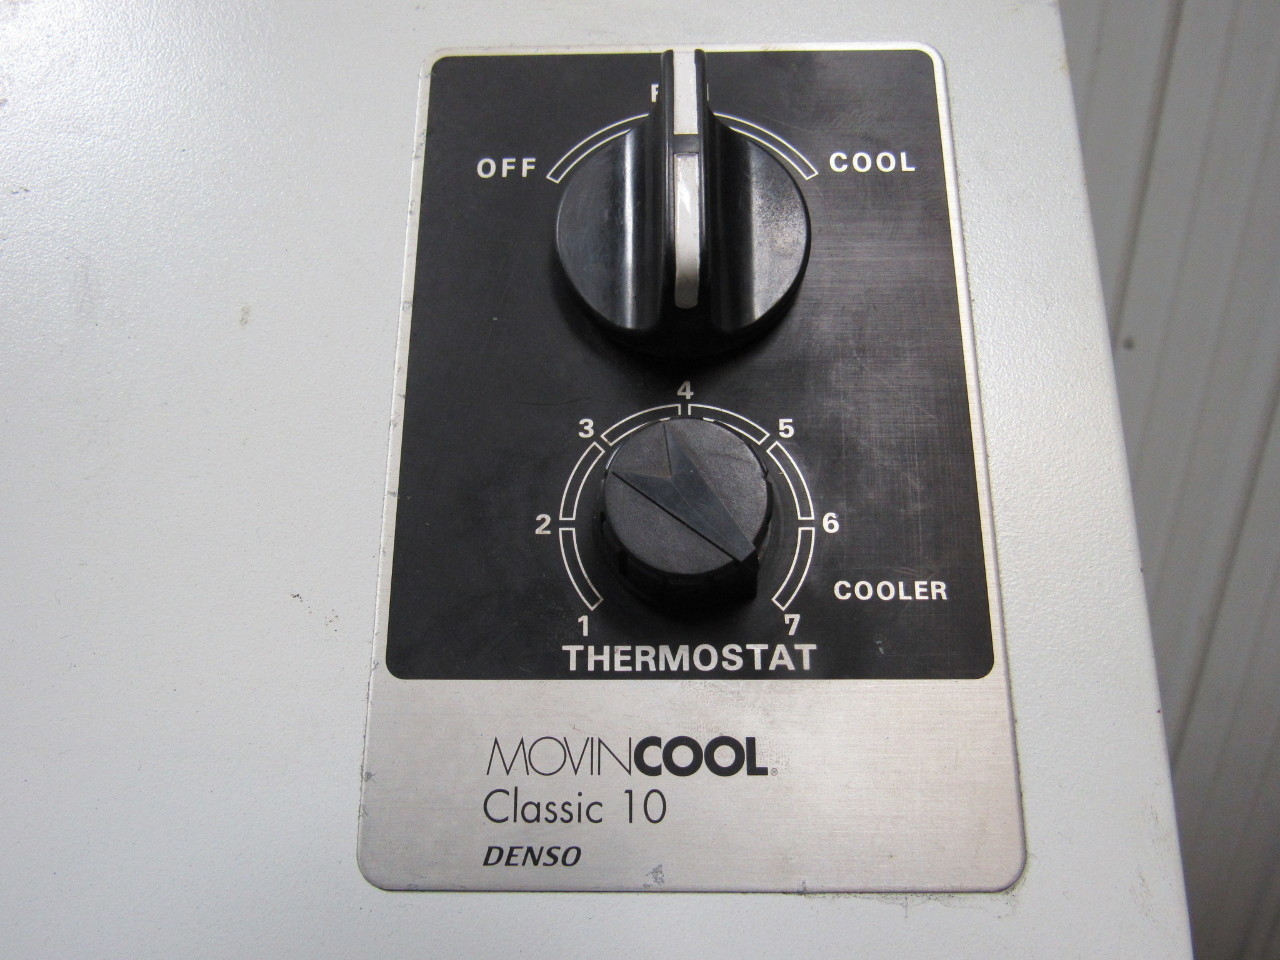 Movincool Classic 10 Portable Air Conditioner 115v 1ph 10 000 Btu/hr  #6F6A5C